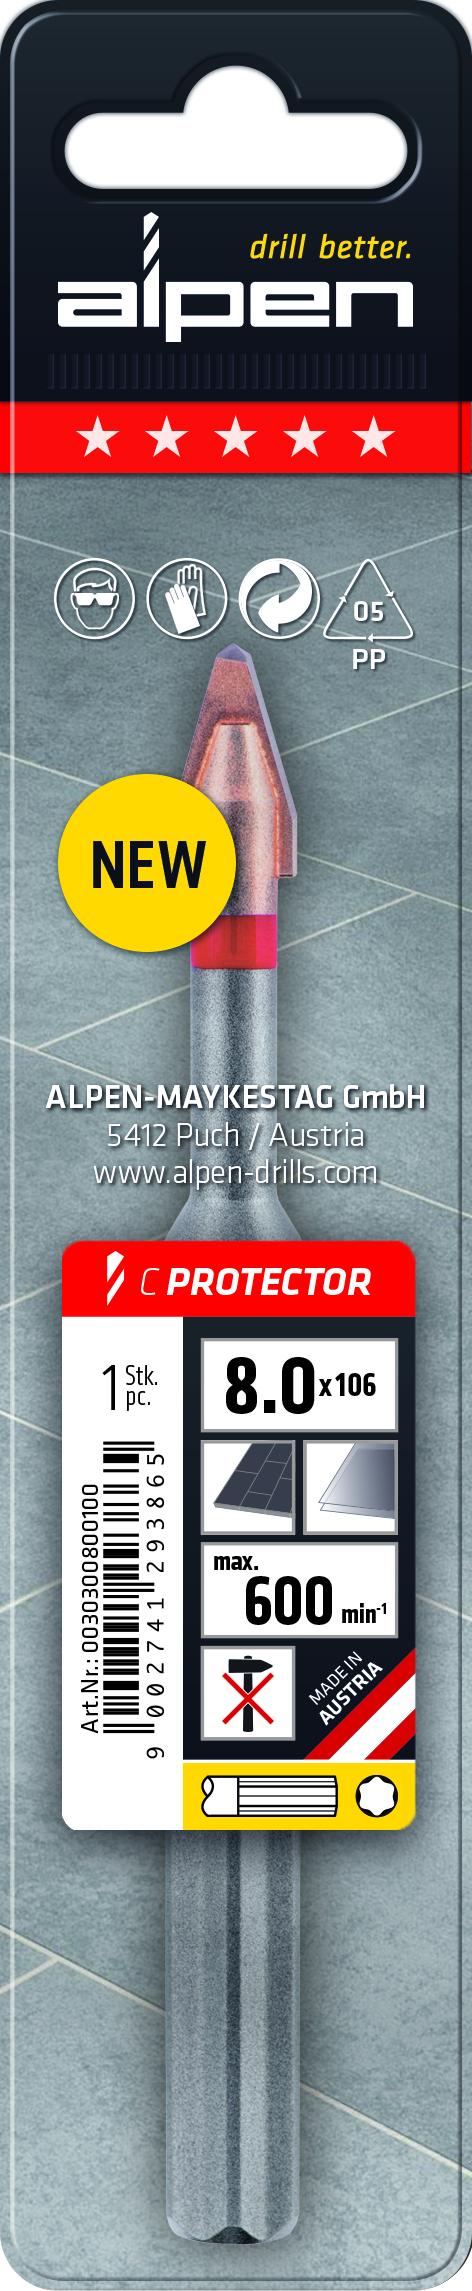 ALPEN C Protector